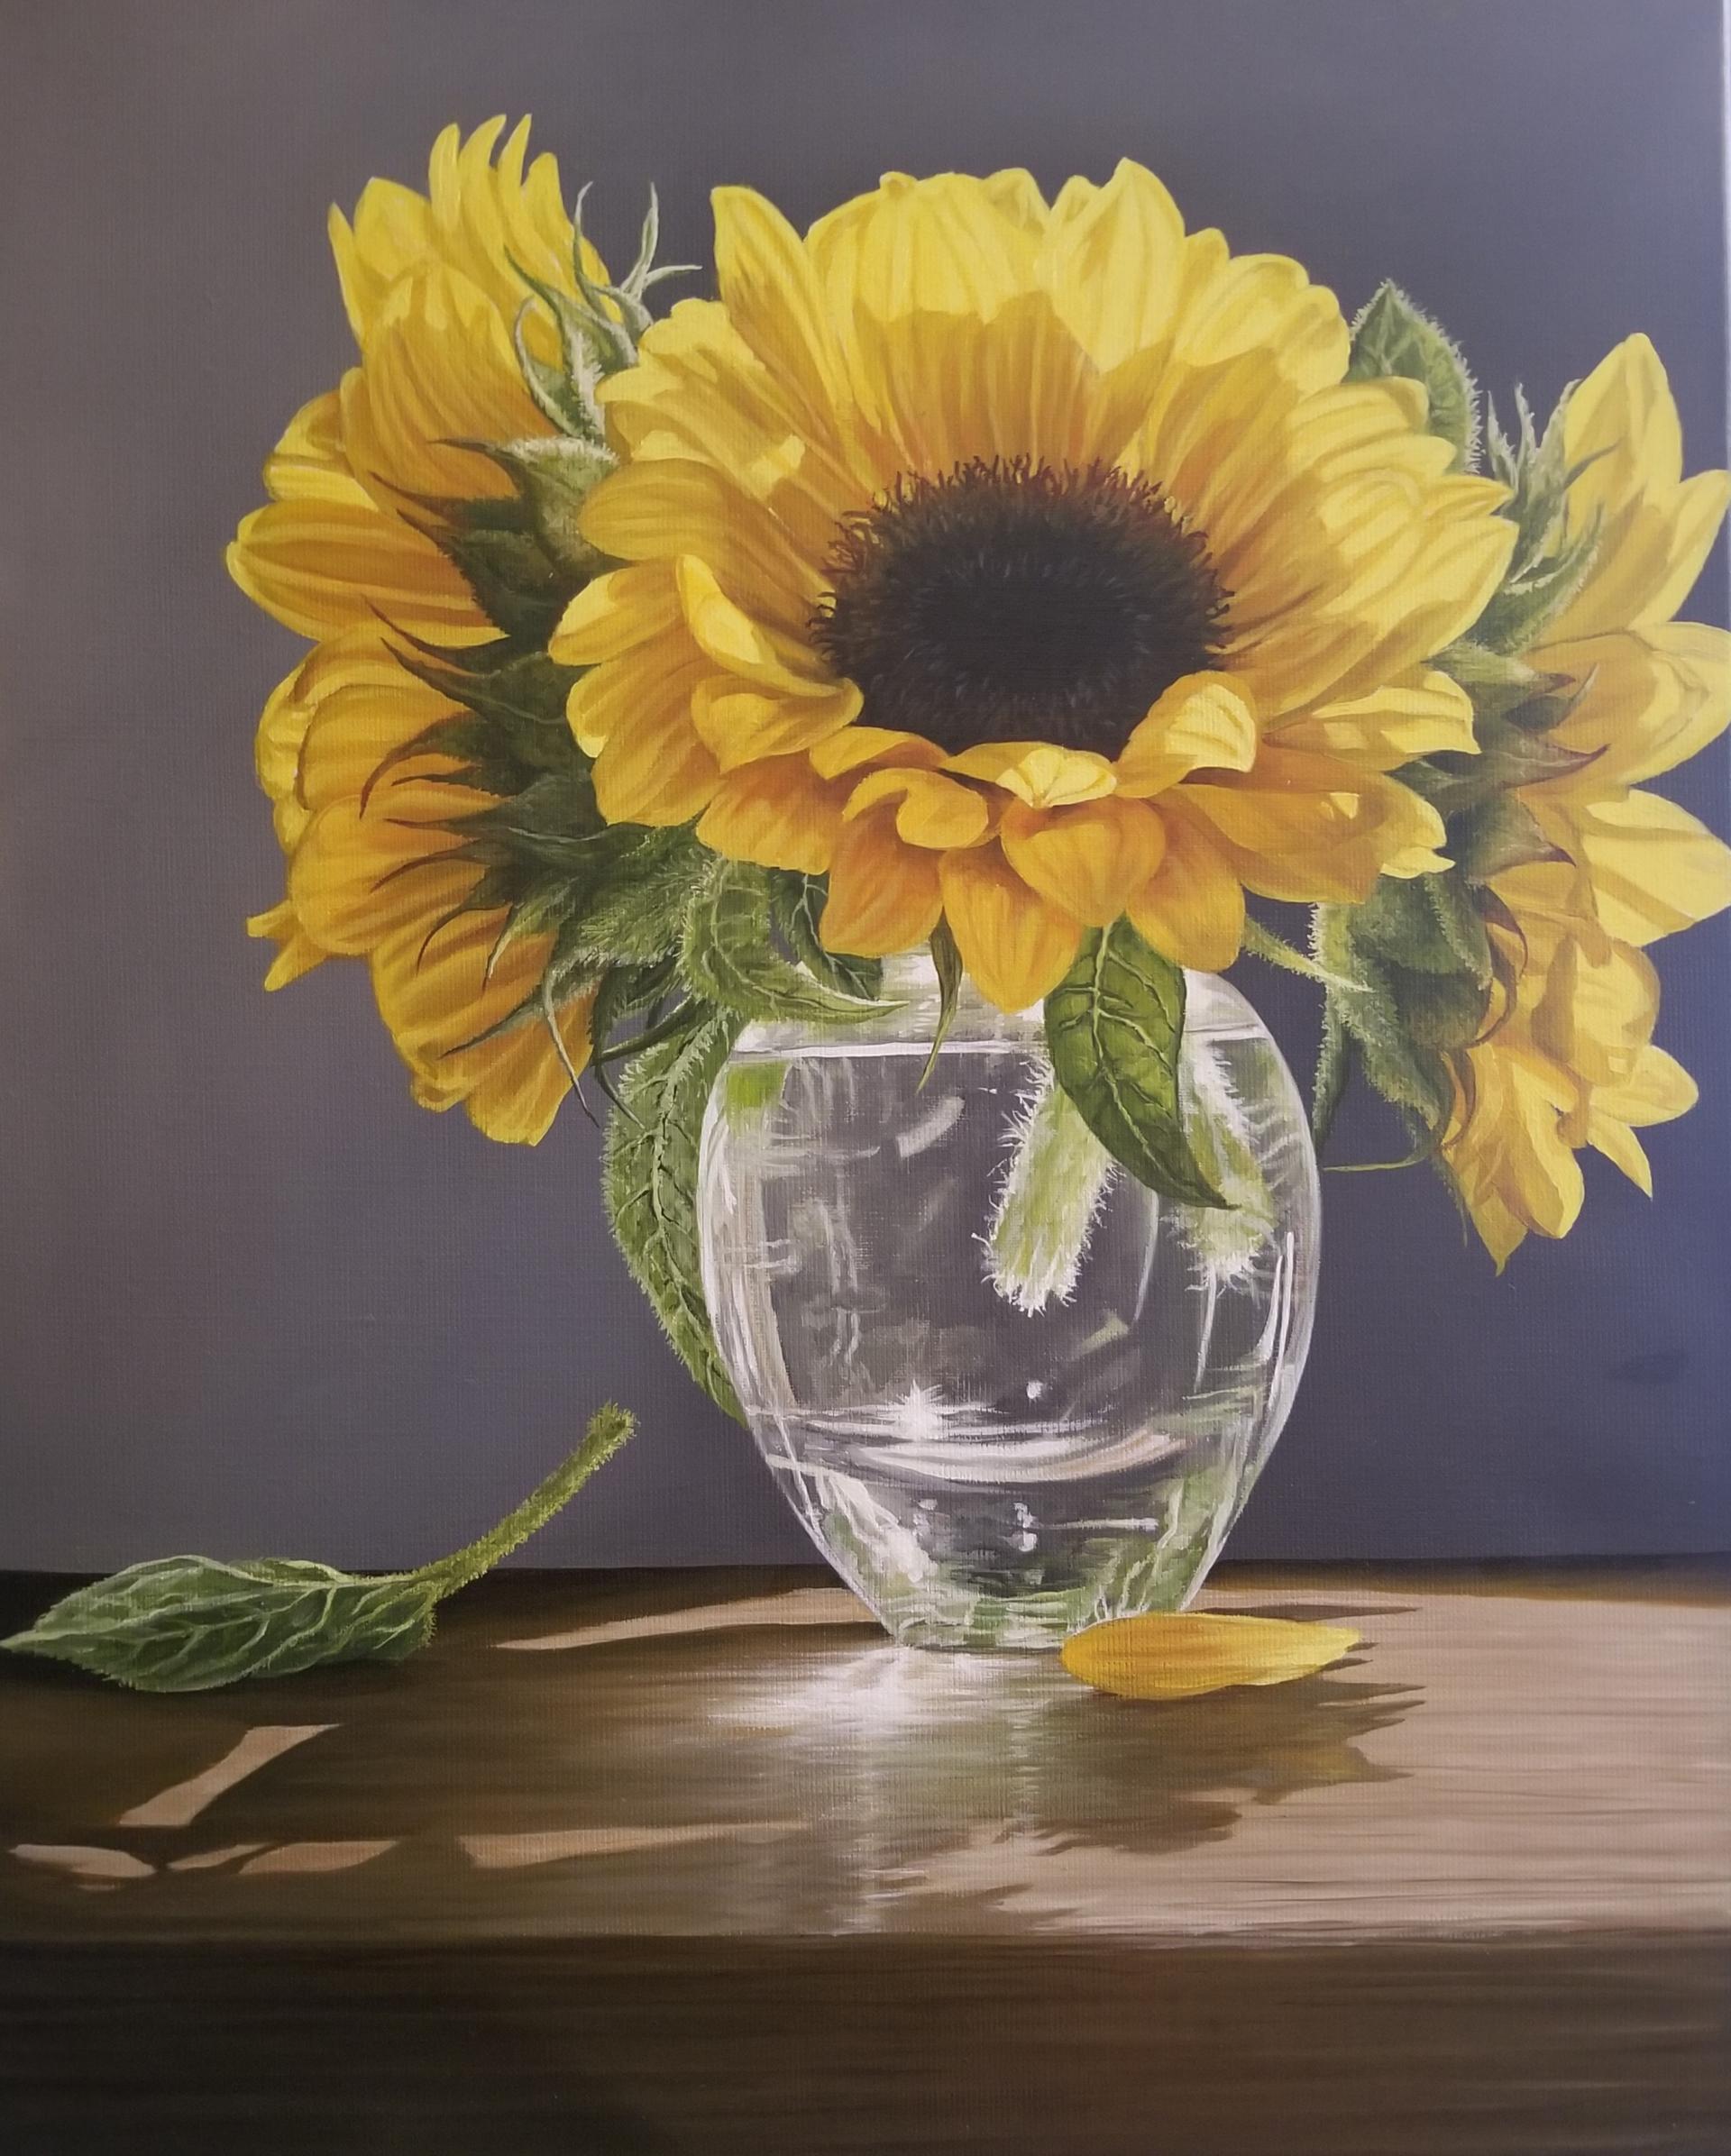 Sunflowers in Vase by Loren DiBenedetto, OPA